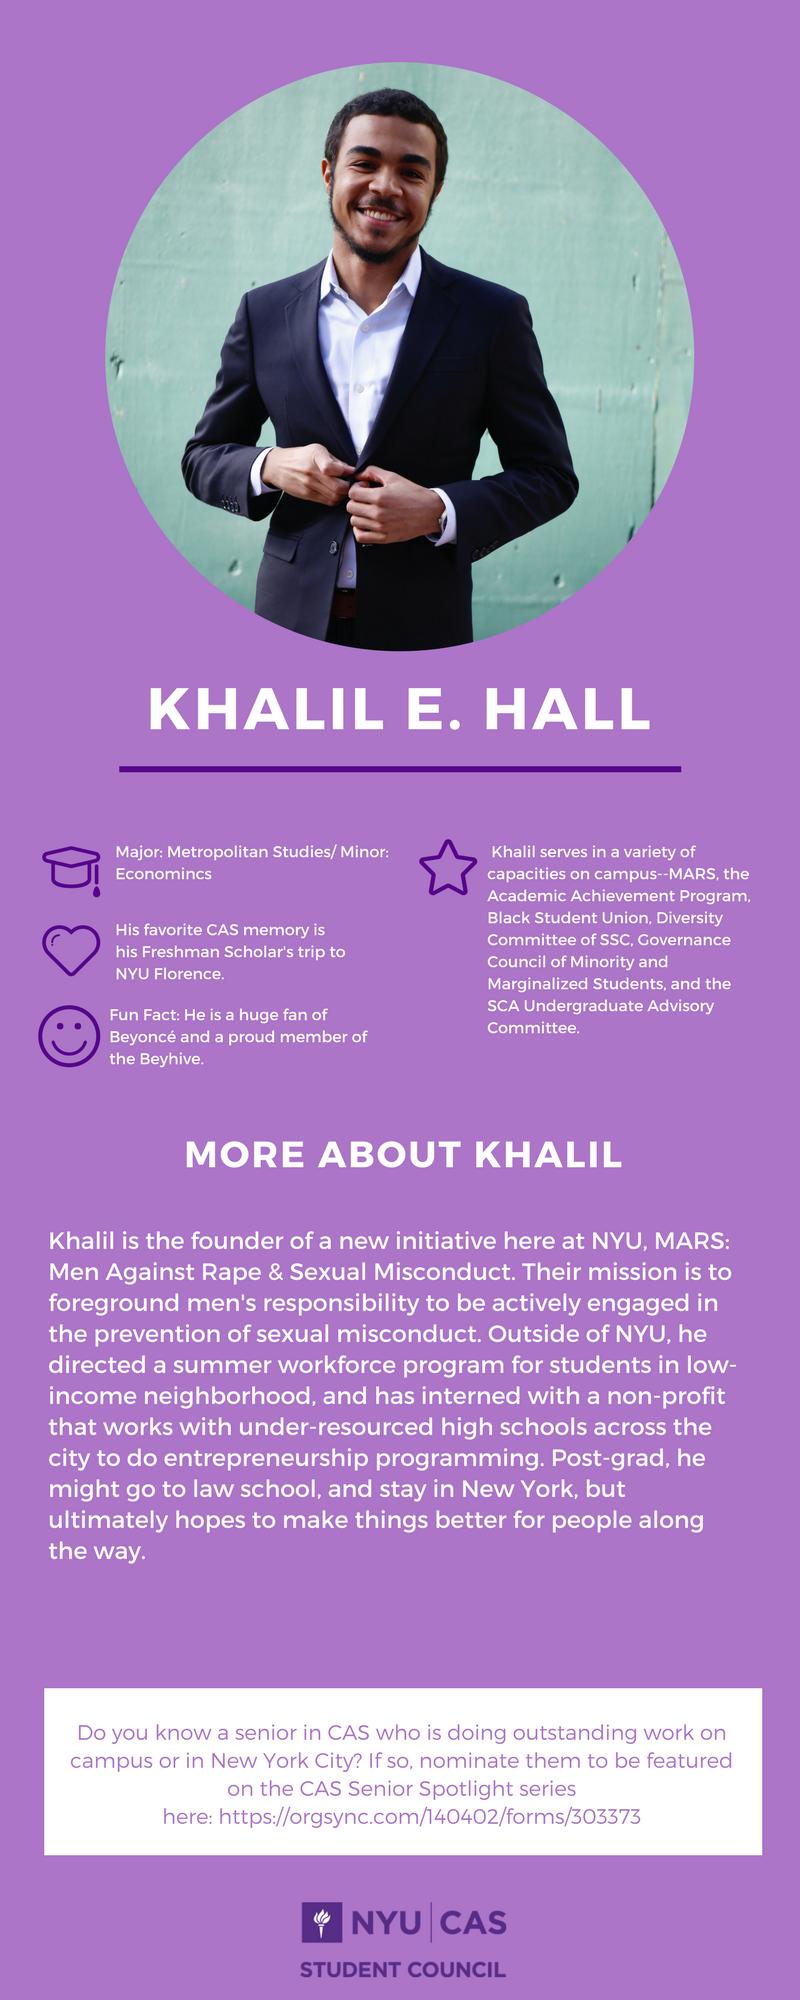 Khalil E. Hall